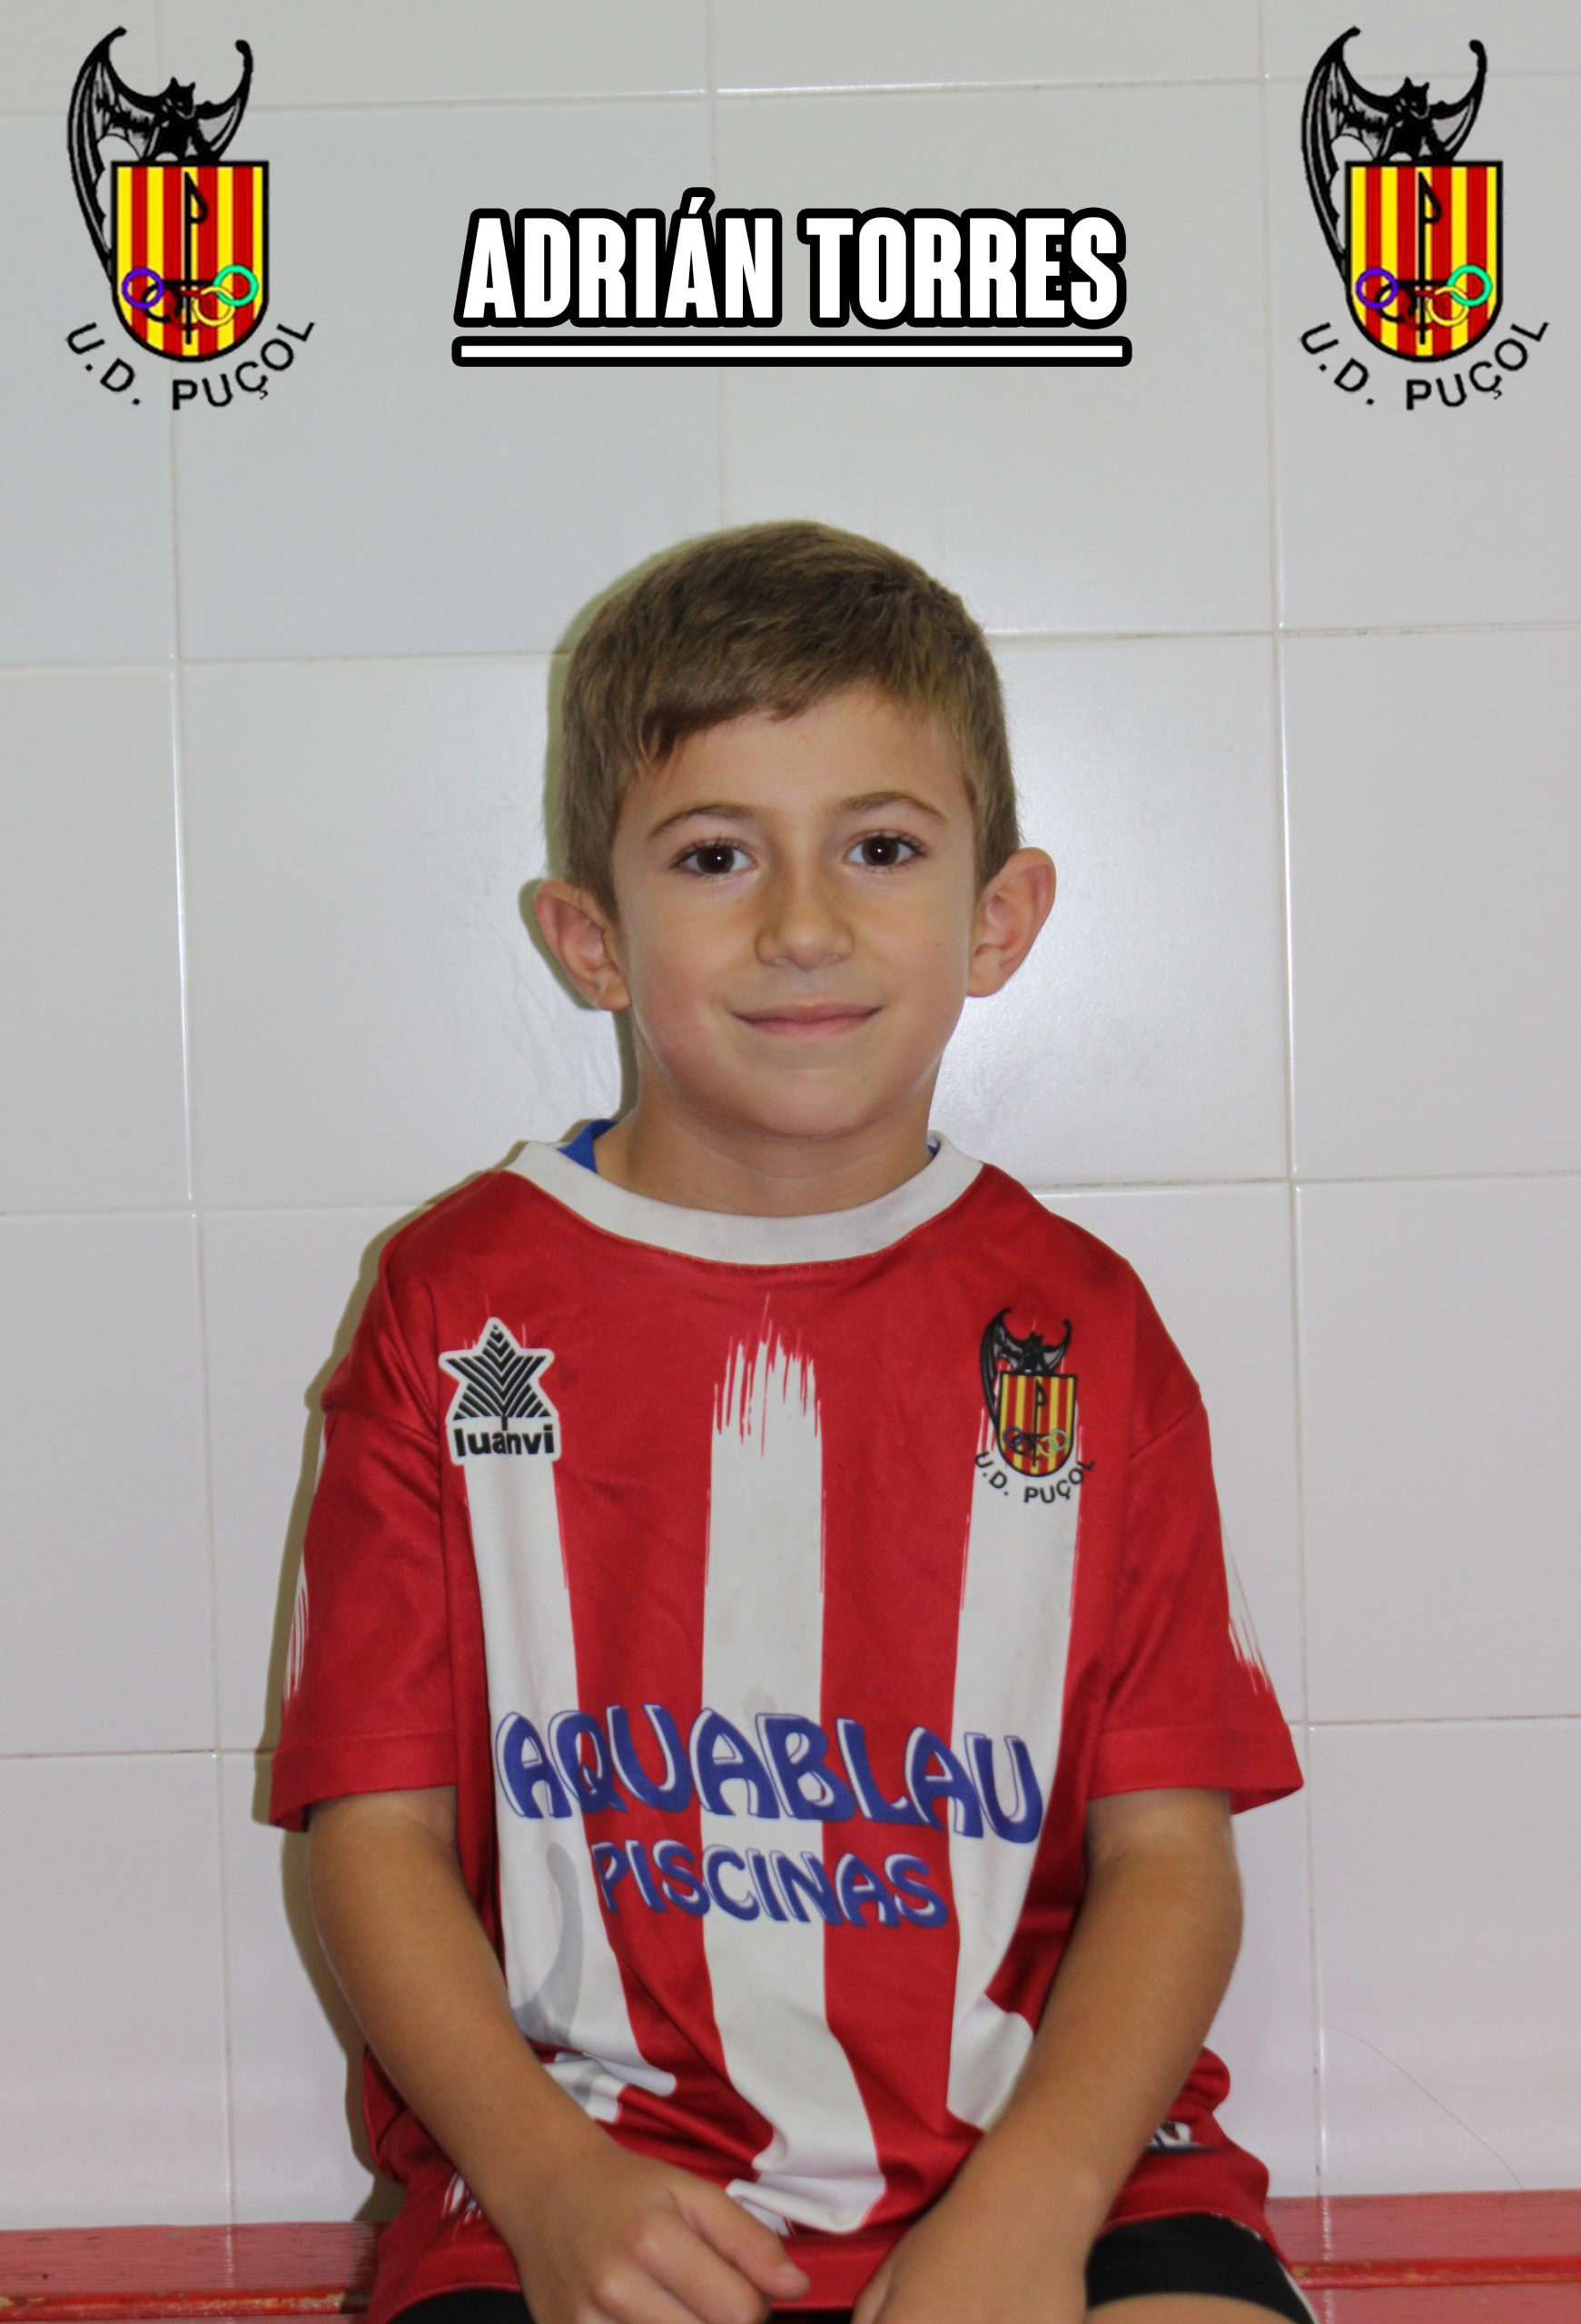 Adrián Torres